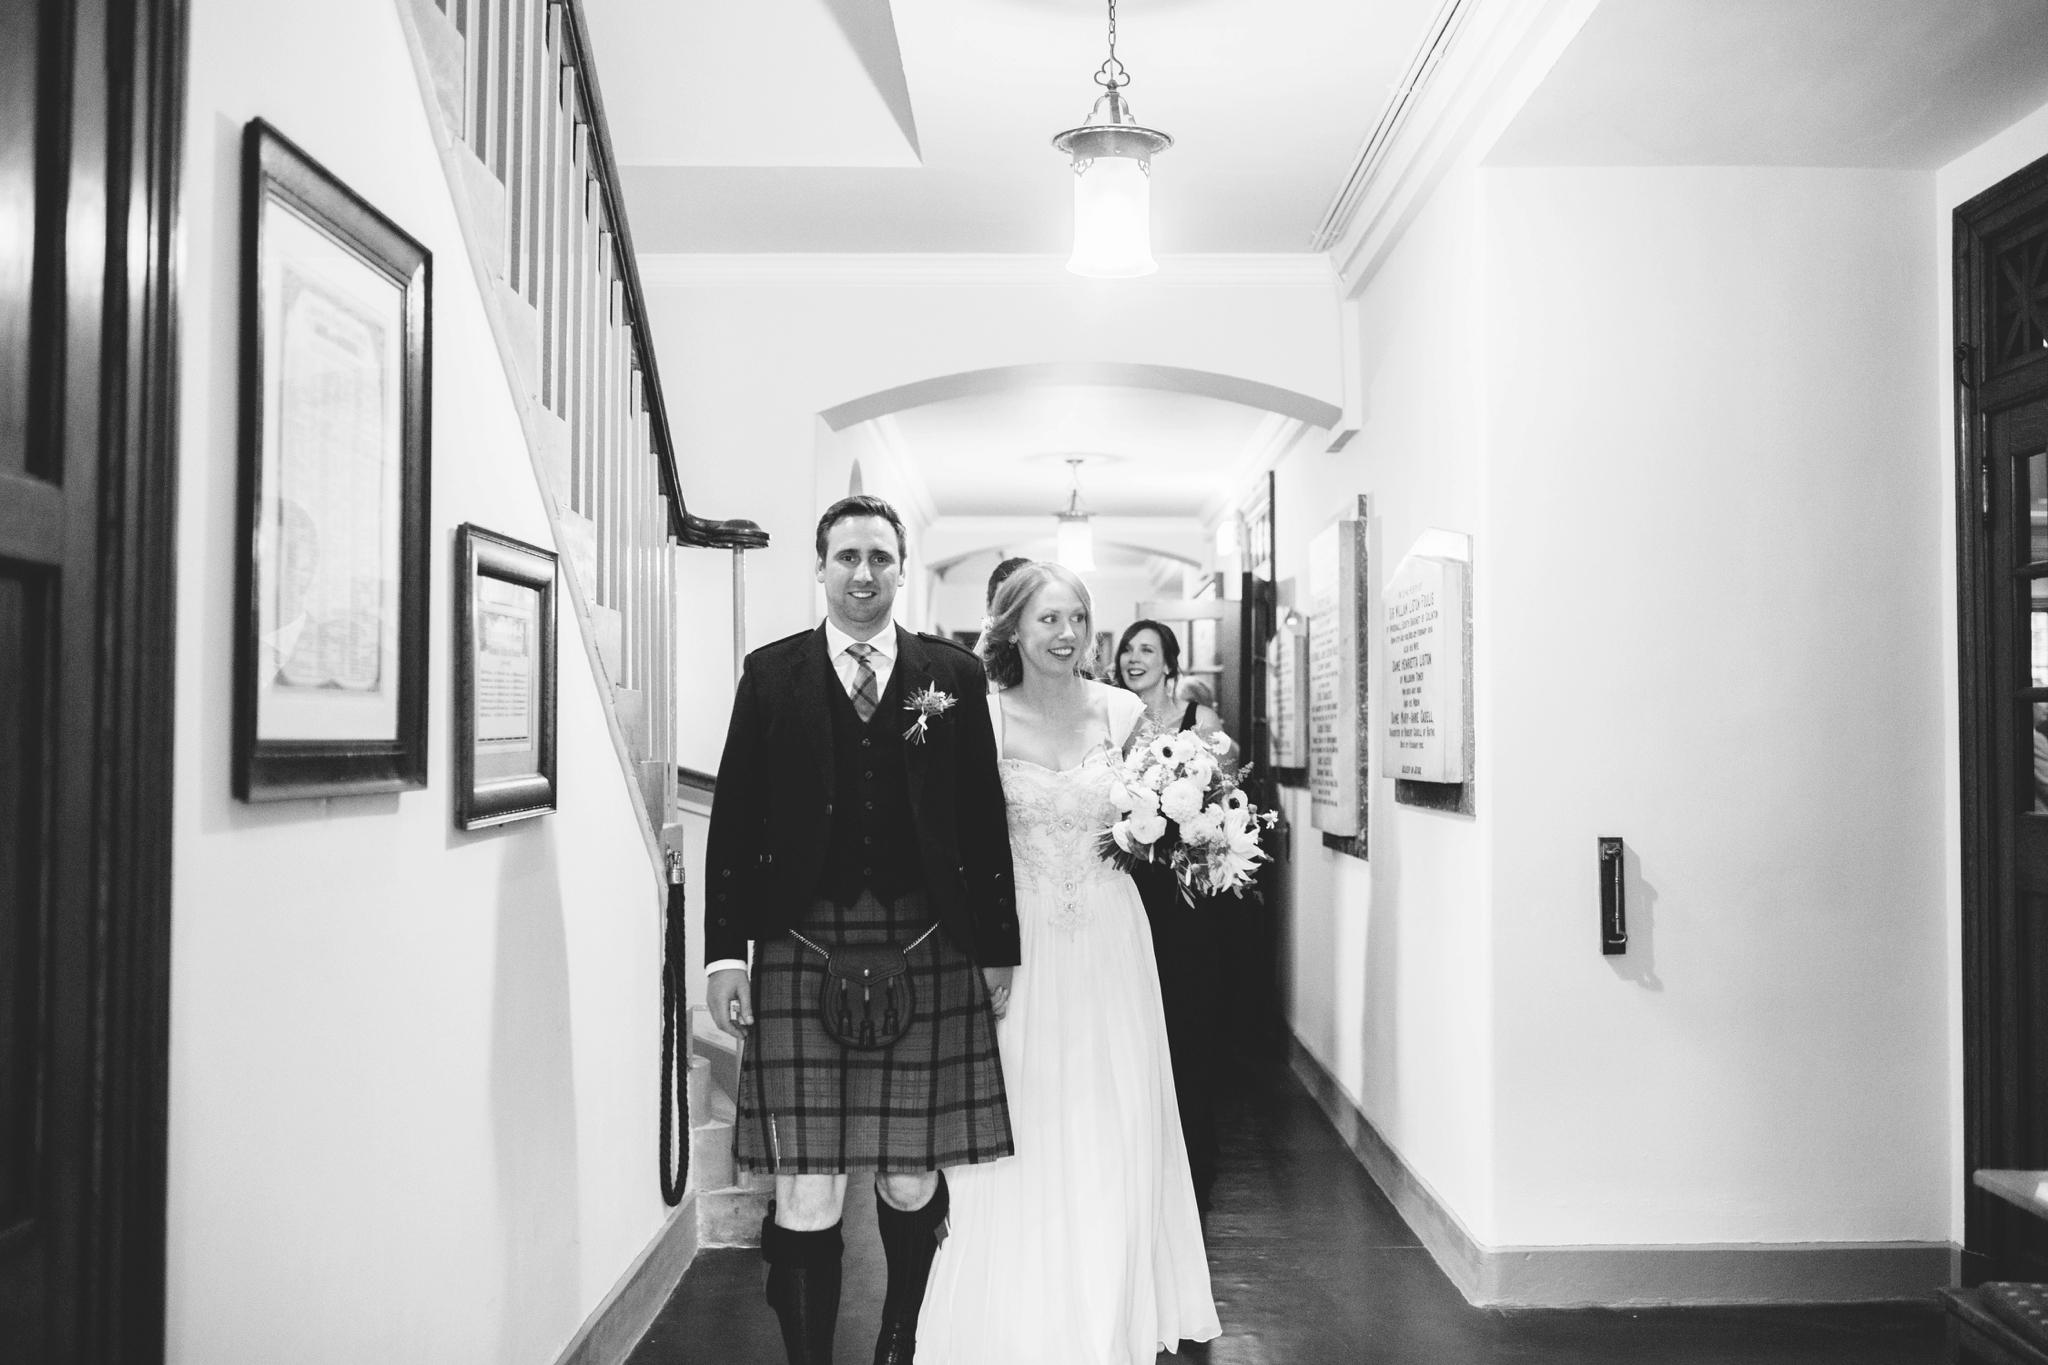 Suzanne_li_photography_kirknewton_wedding_0047.jpg